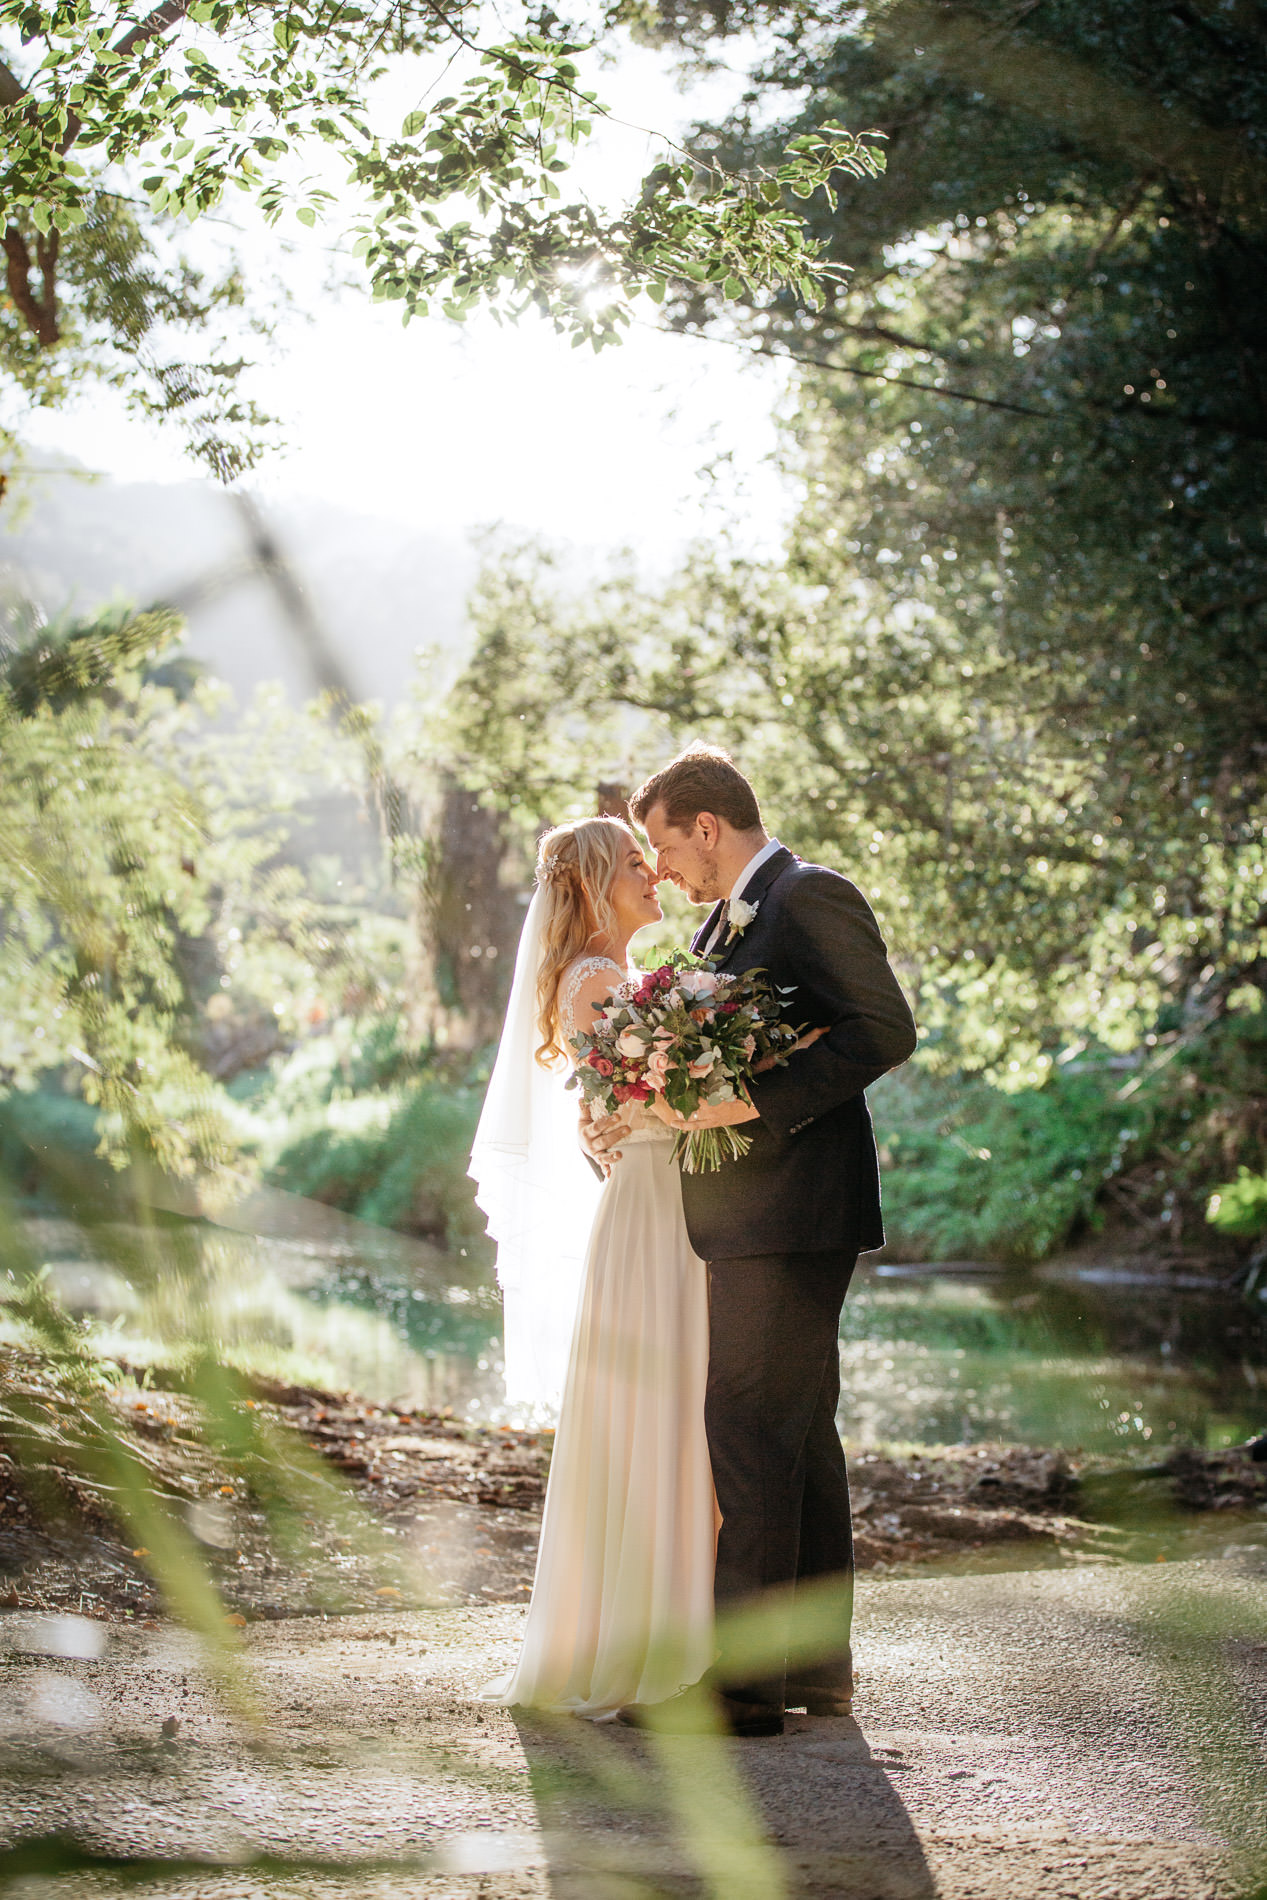 True North Photography_Boomerang Farm_Stacey and Isaac_Gold Coast Wedding_Barm Wedding_Hinterland Wedding-139.jpg